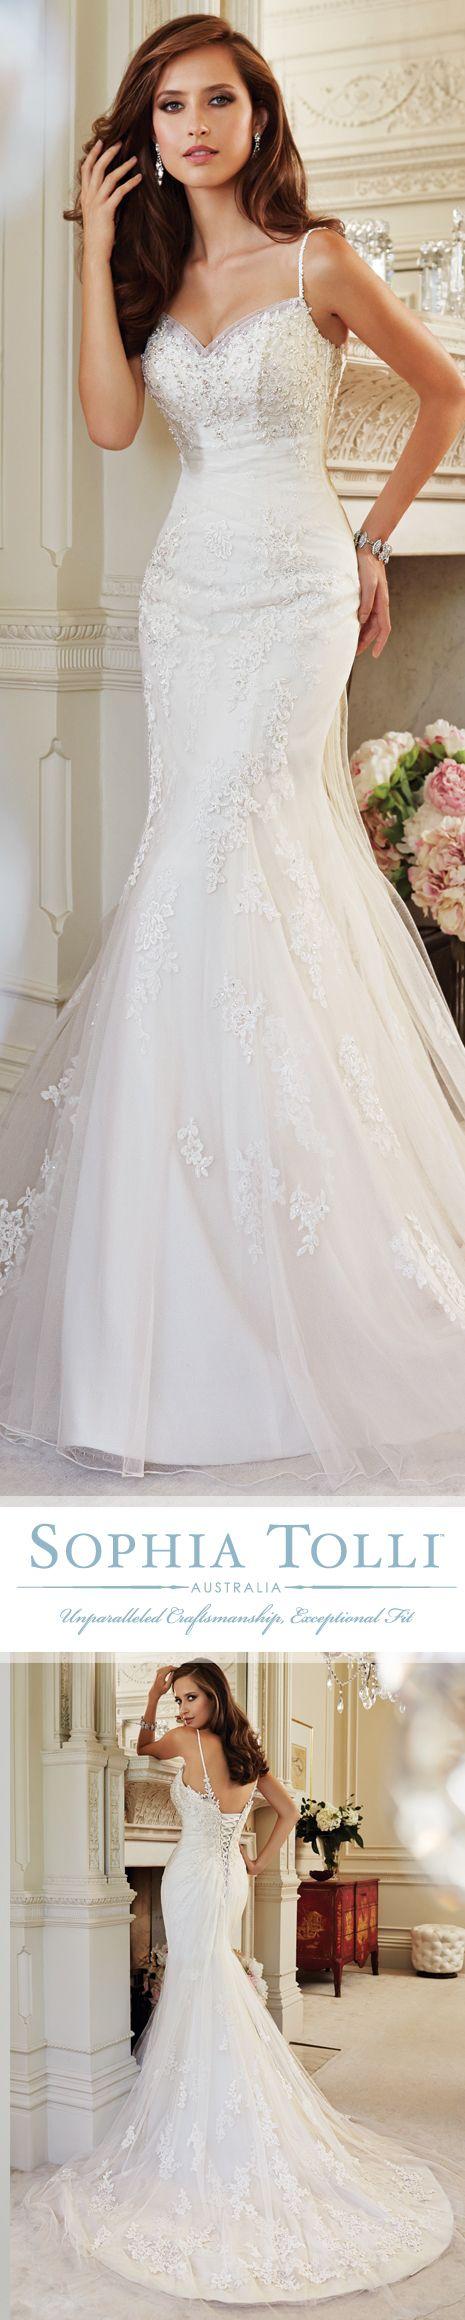 Style no y cloris wedding dresses collection u this